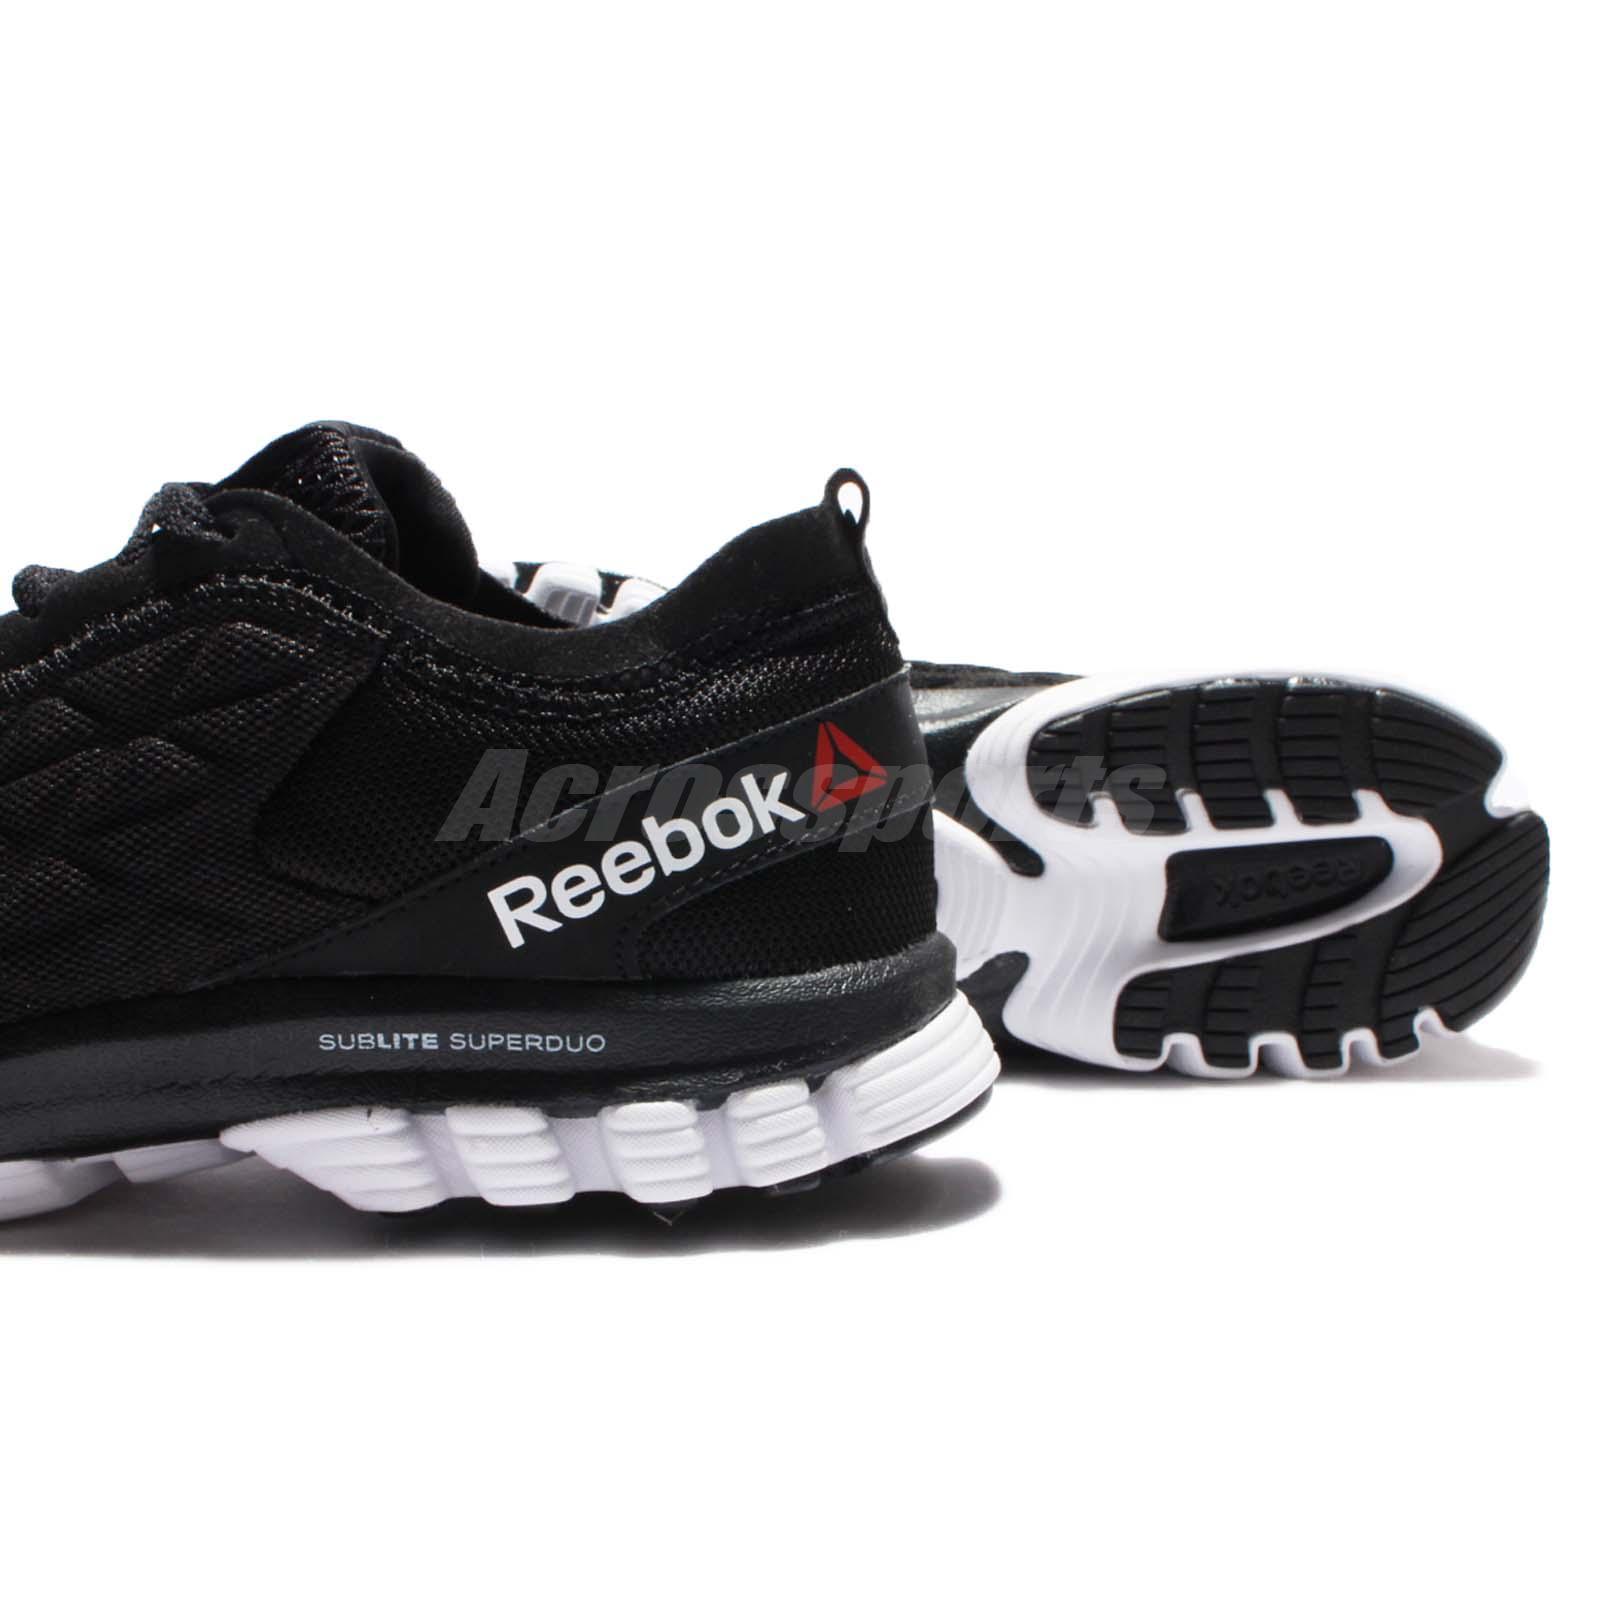 Reebok Sublite Super DUO 3.0 III Black White Women Running Shoes ... 02b474b52